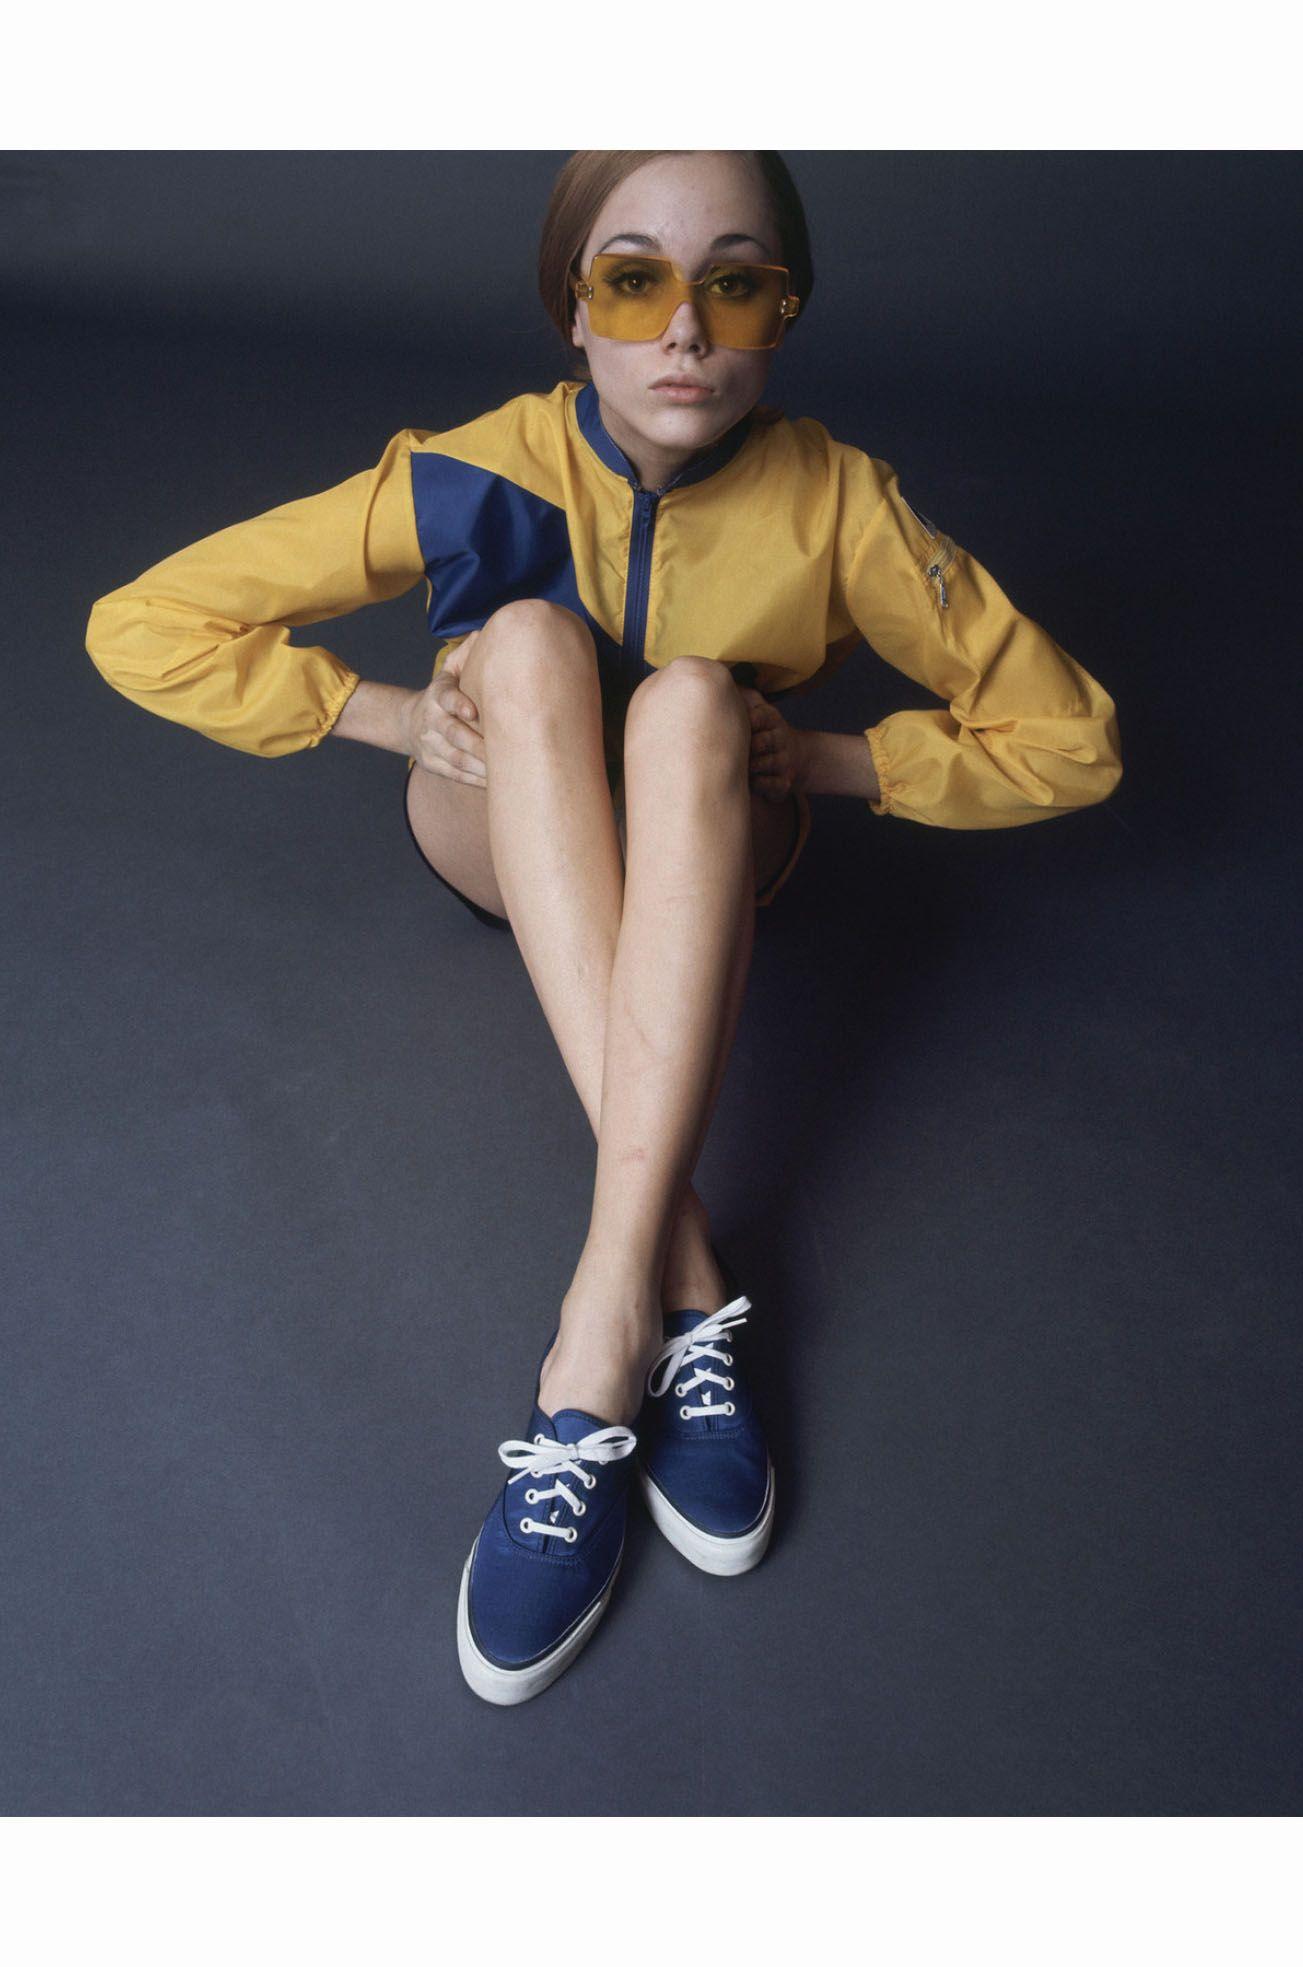 Model Jane Hitchcock wearing a bright yellow windbreaker